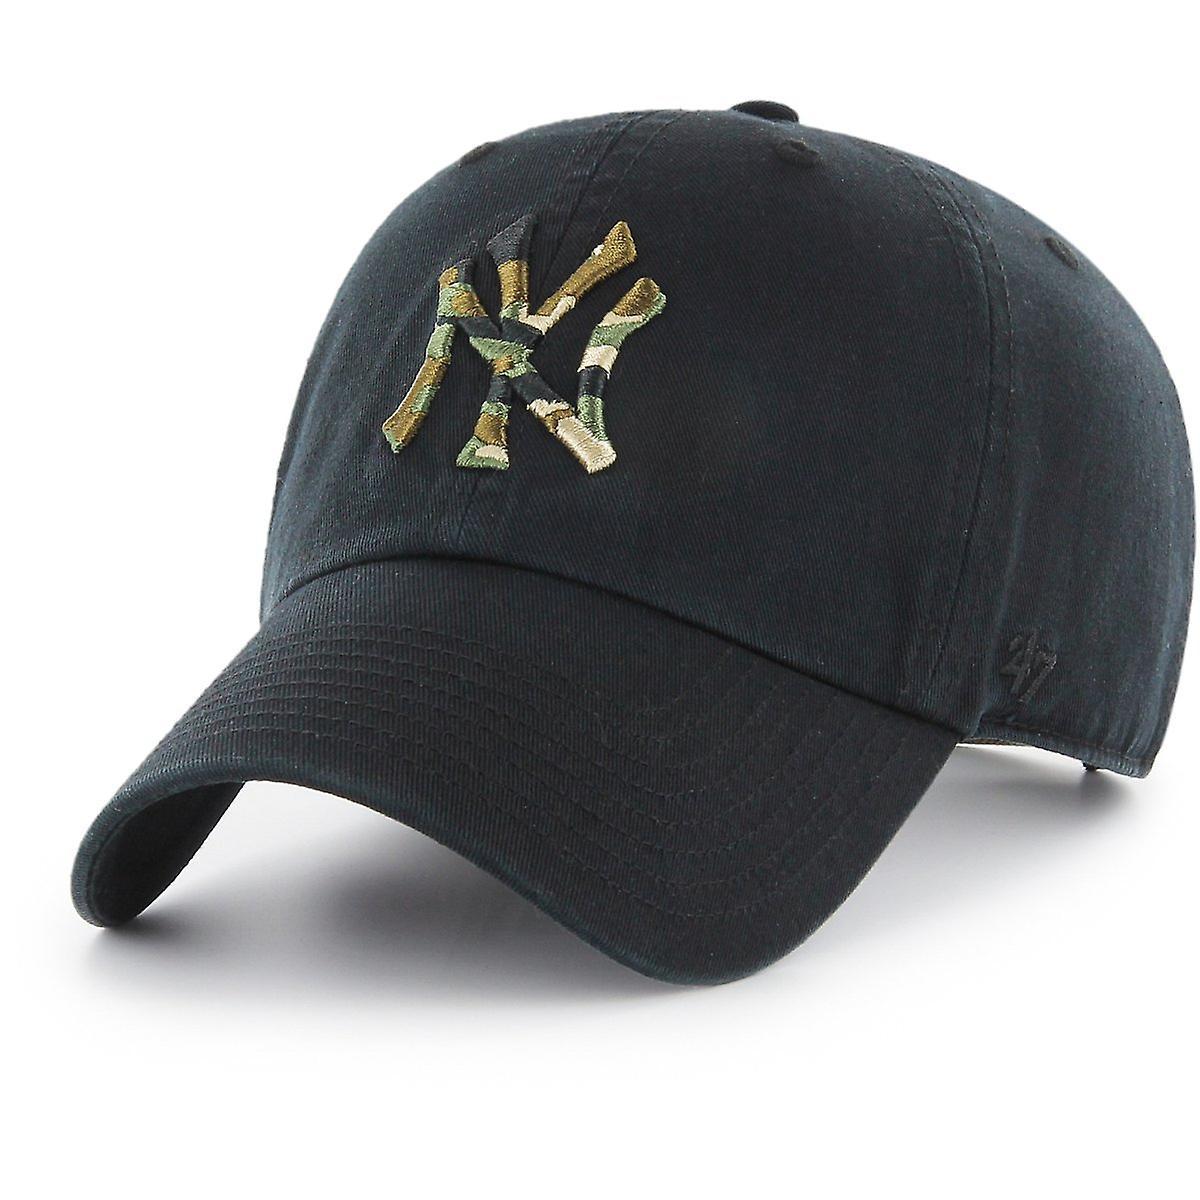 47 ogień regulowane Cap - CAMOFILL New York Yankees czarny